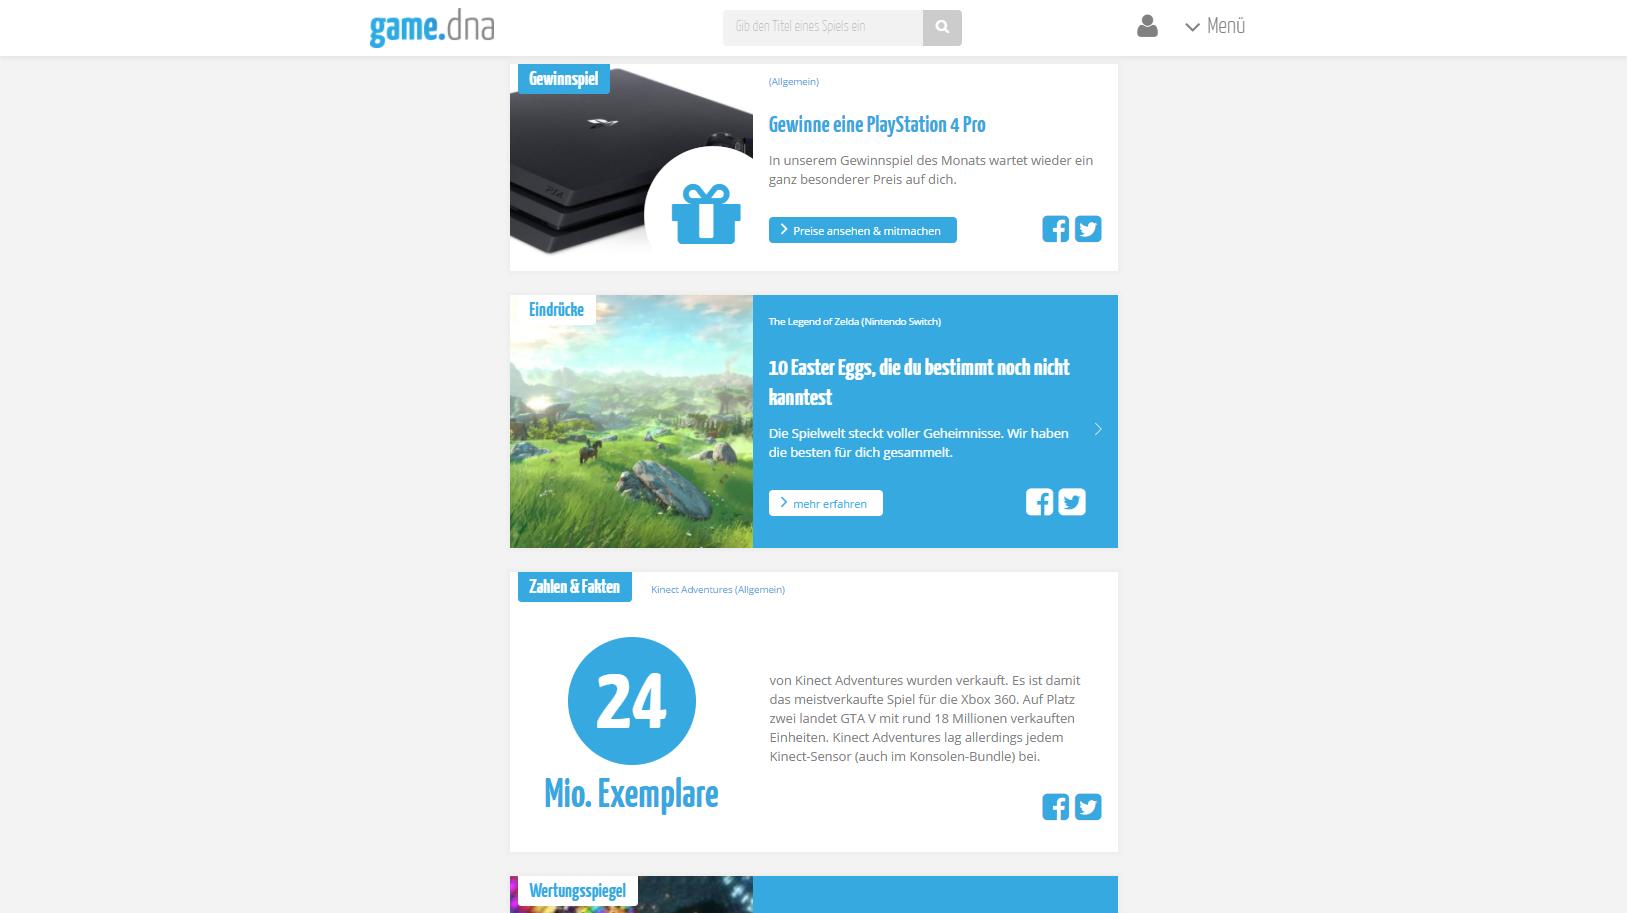 game-dna-wallpaper-logo-nat-games